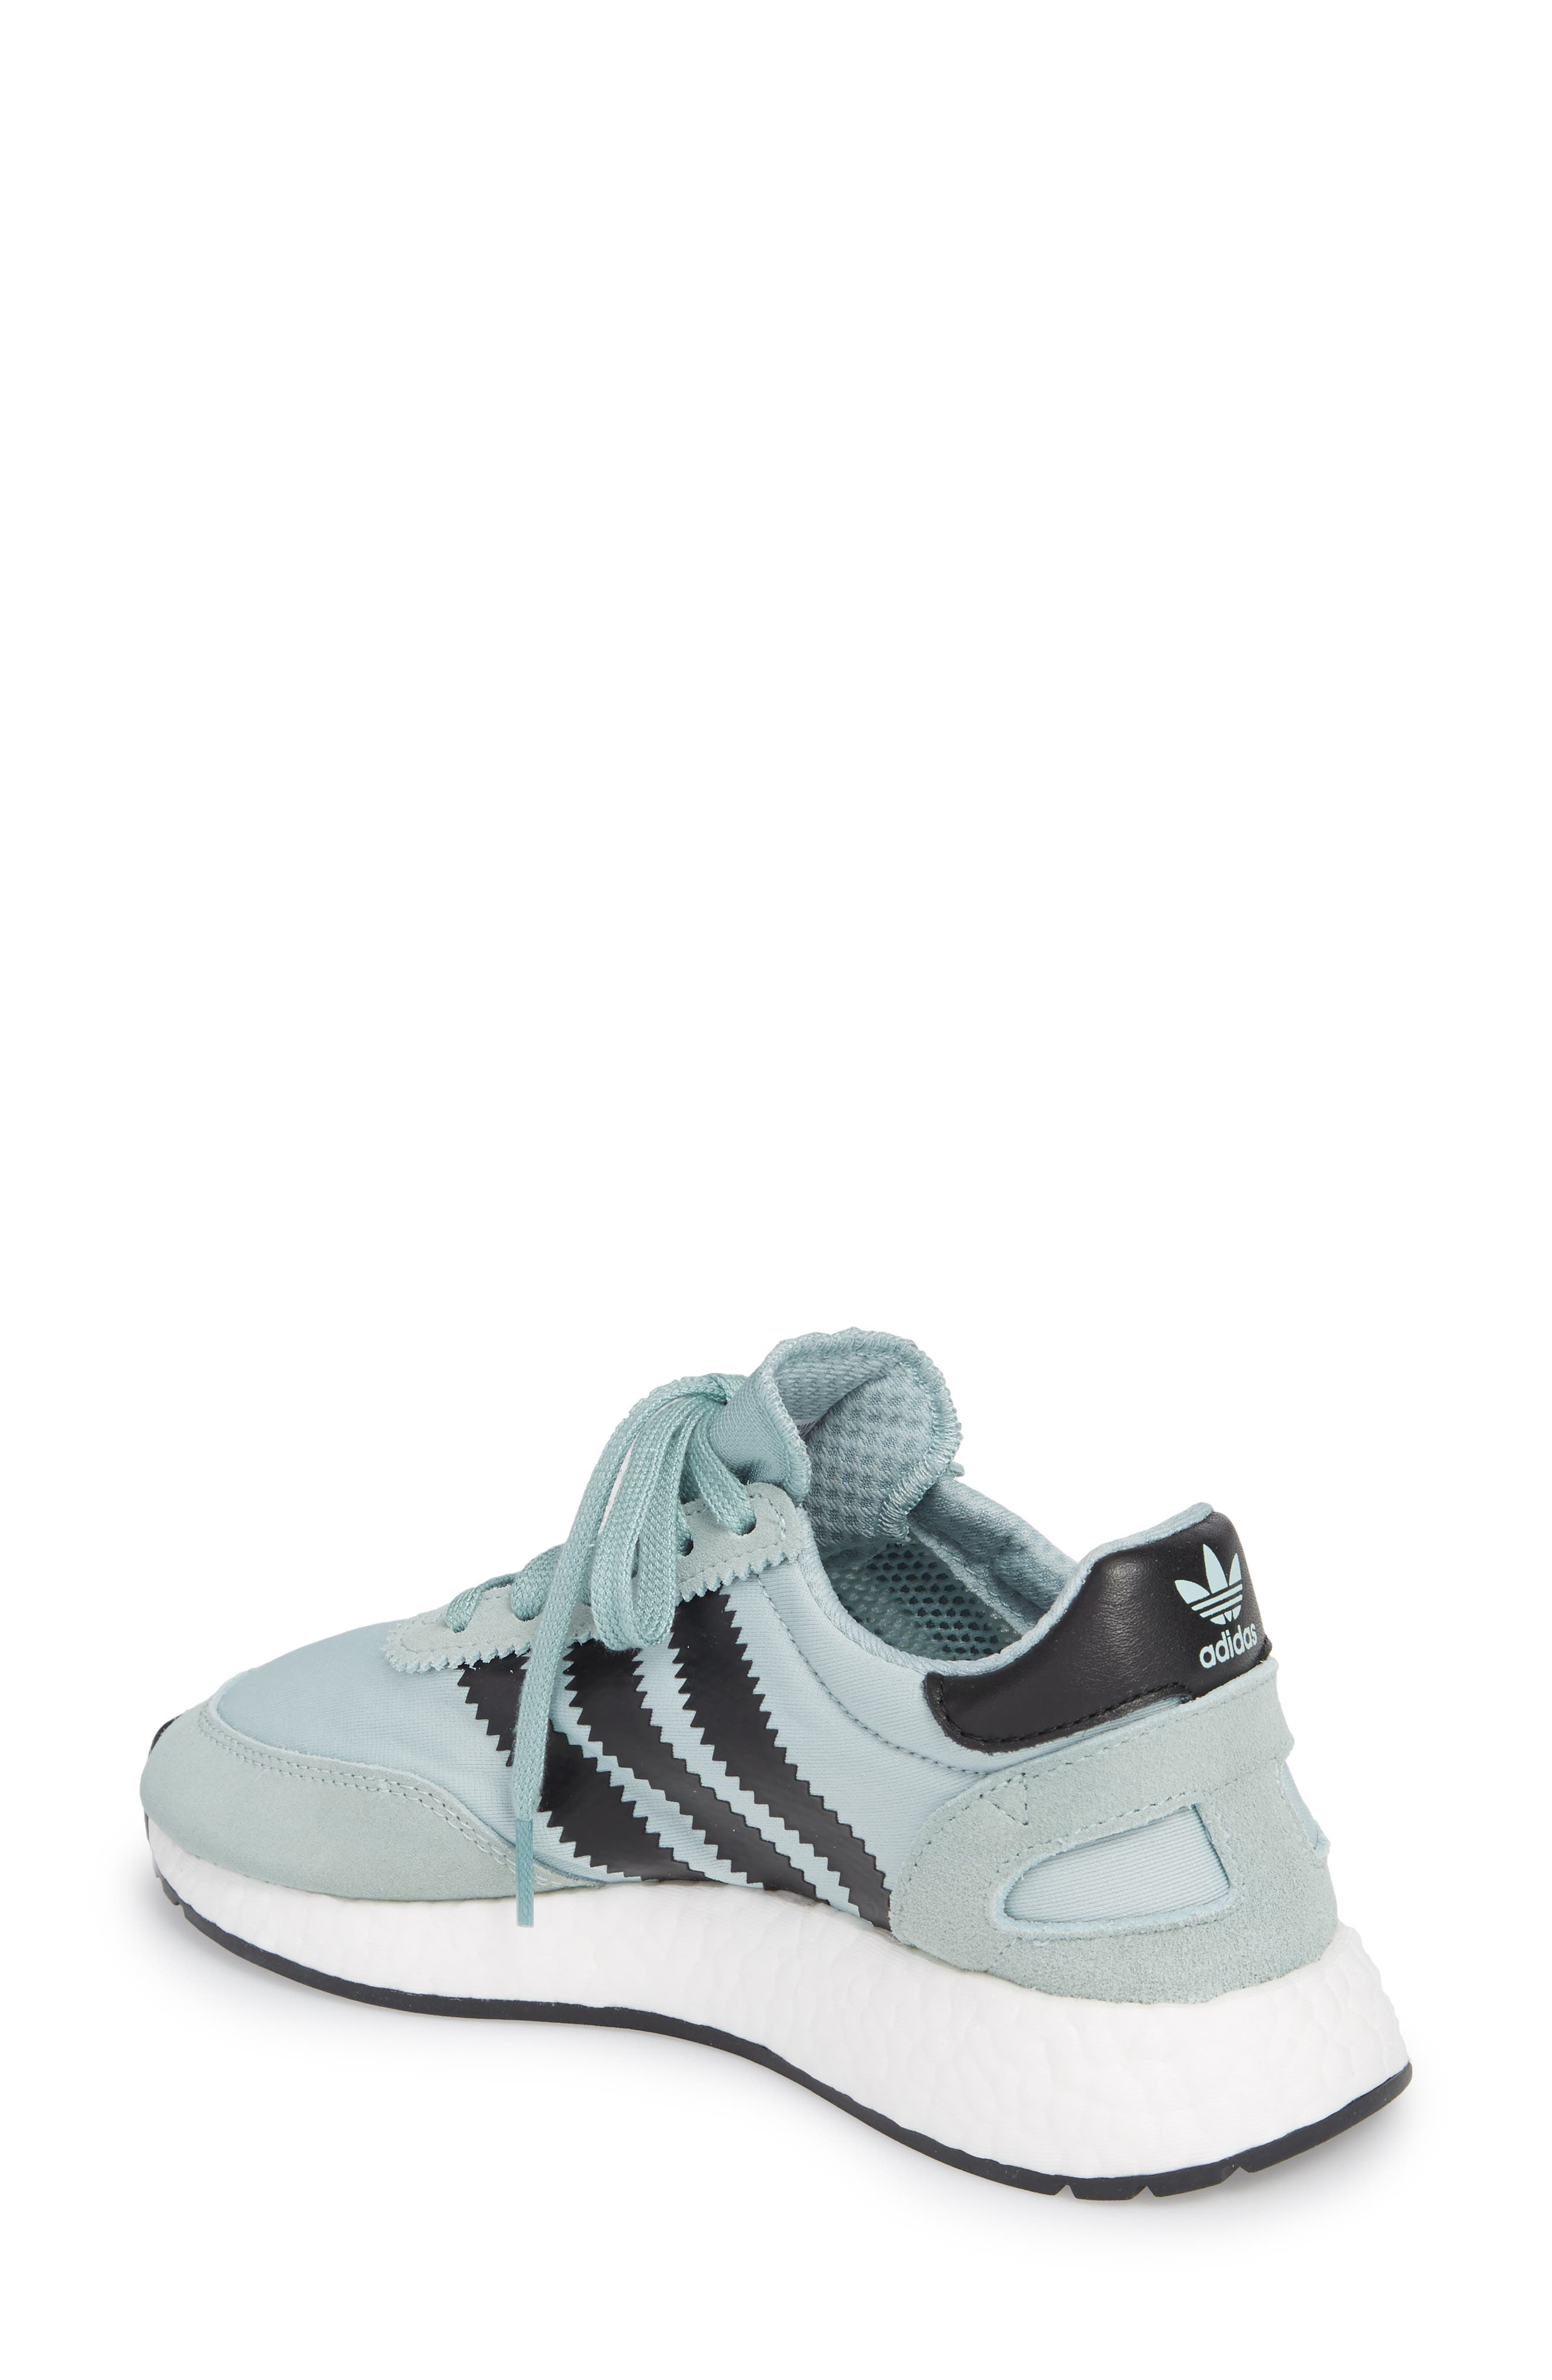 I-5923 Sneaker,                             Alternate thumbnail 2, color,                             Tactile Green/ Black/ White